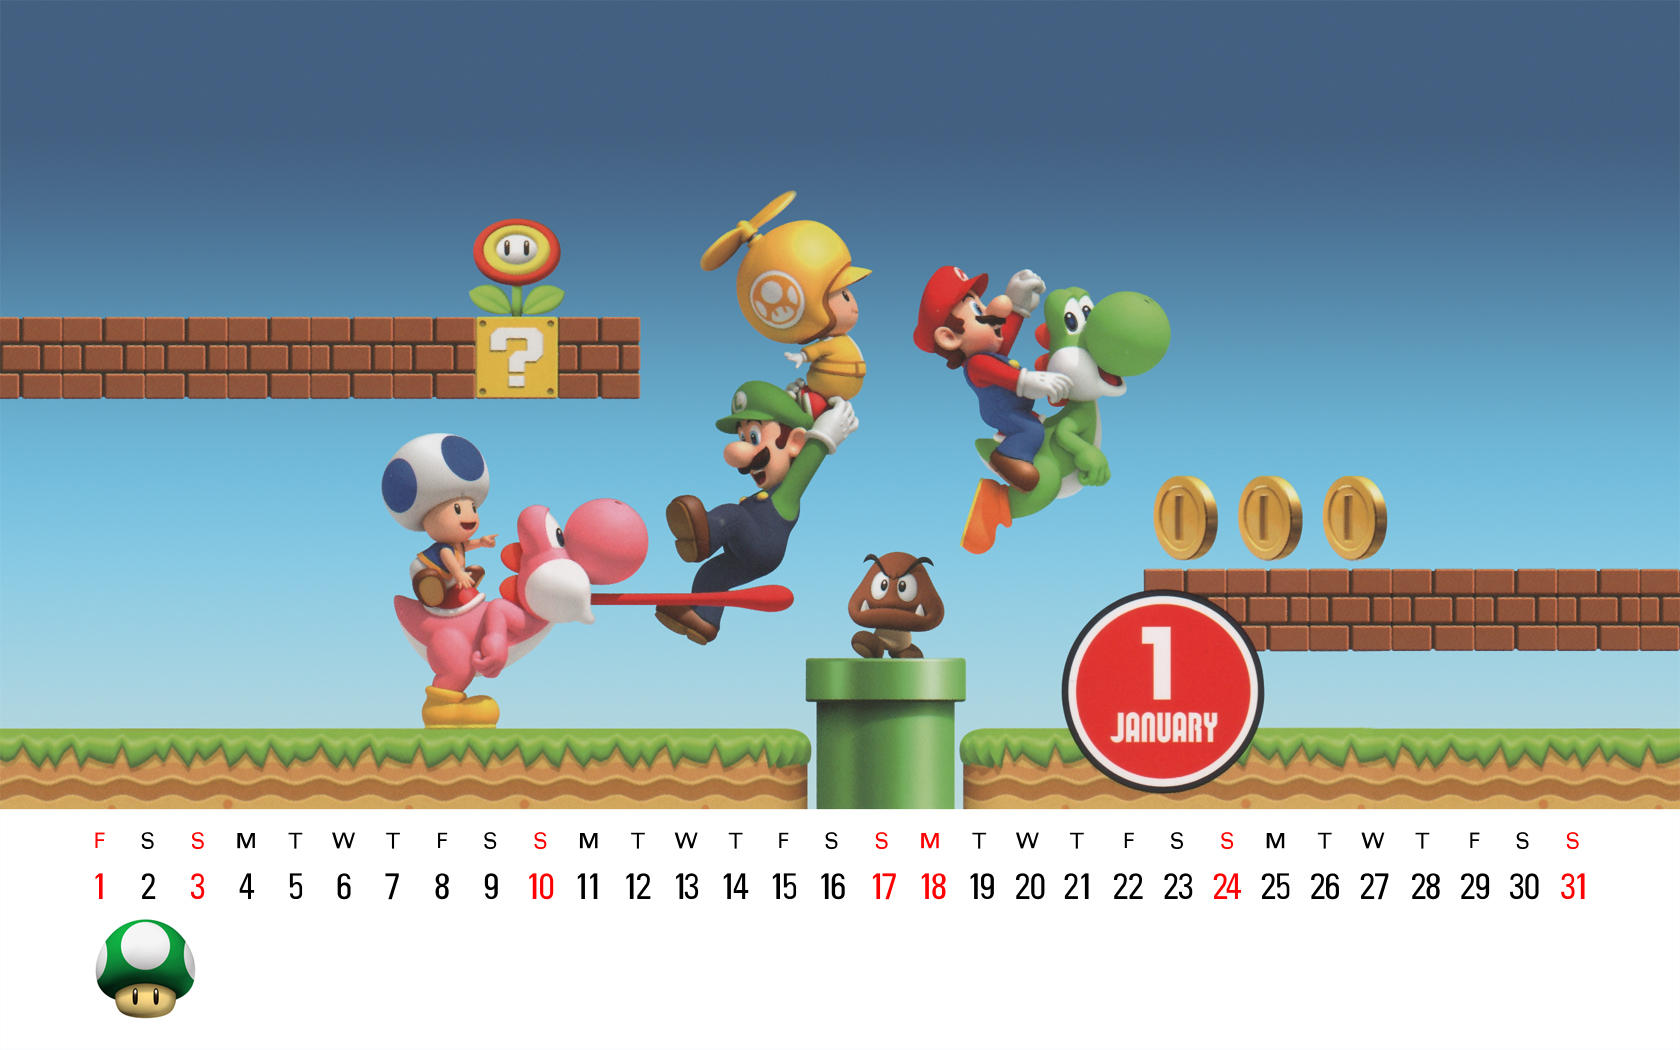 Calendar Wallpaper Nintendo : Club nintendo january by sora on deviantart